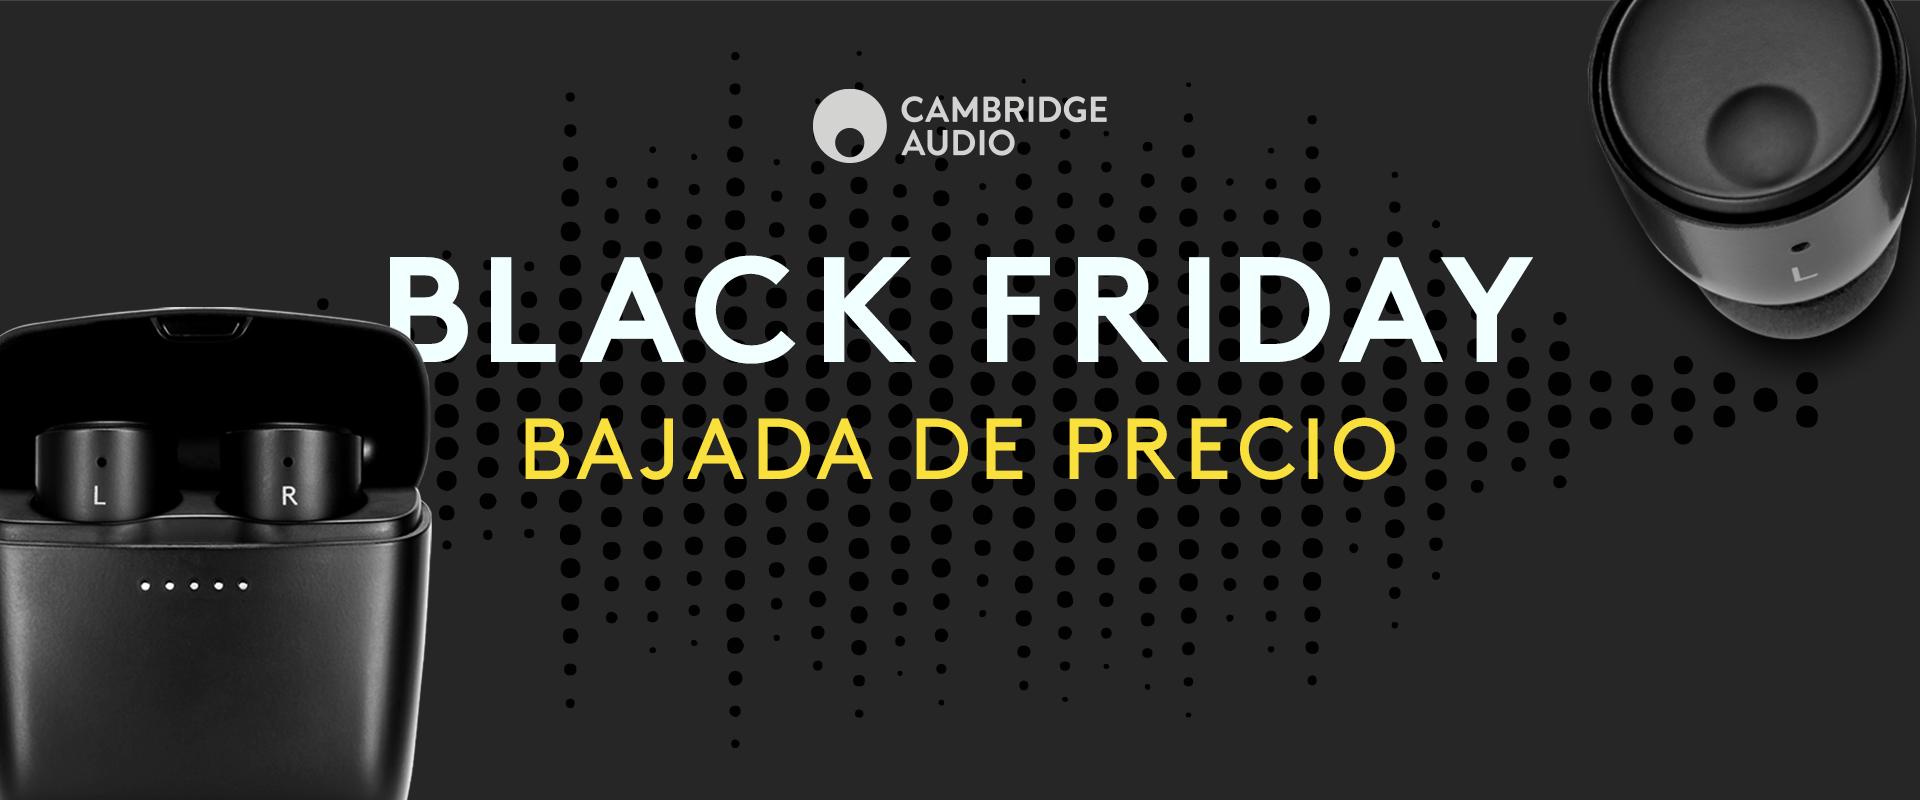 Black-Friday-_-Melomania-1-_-Cambridge-Audio